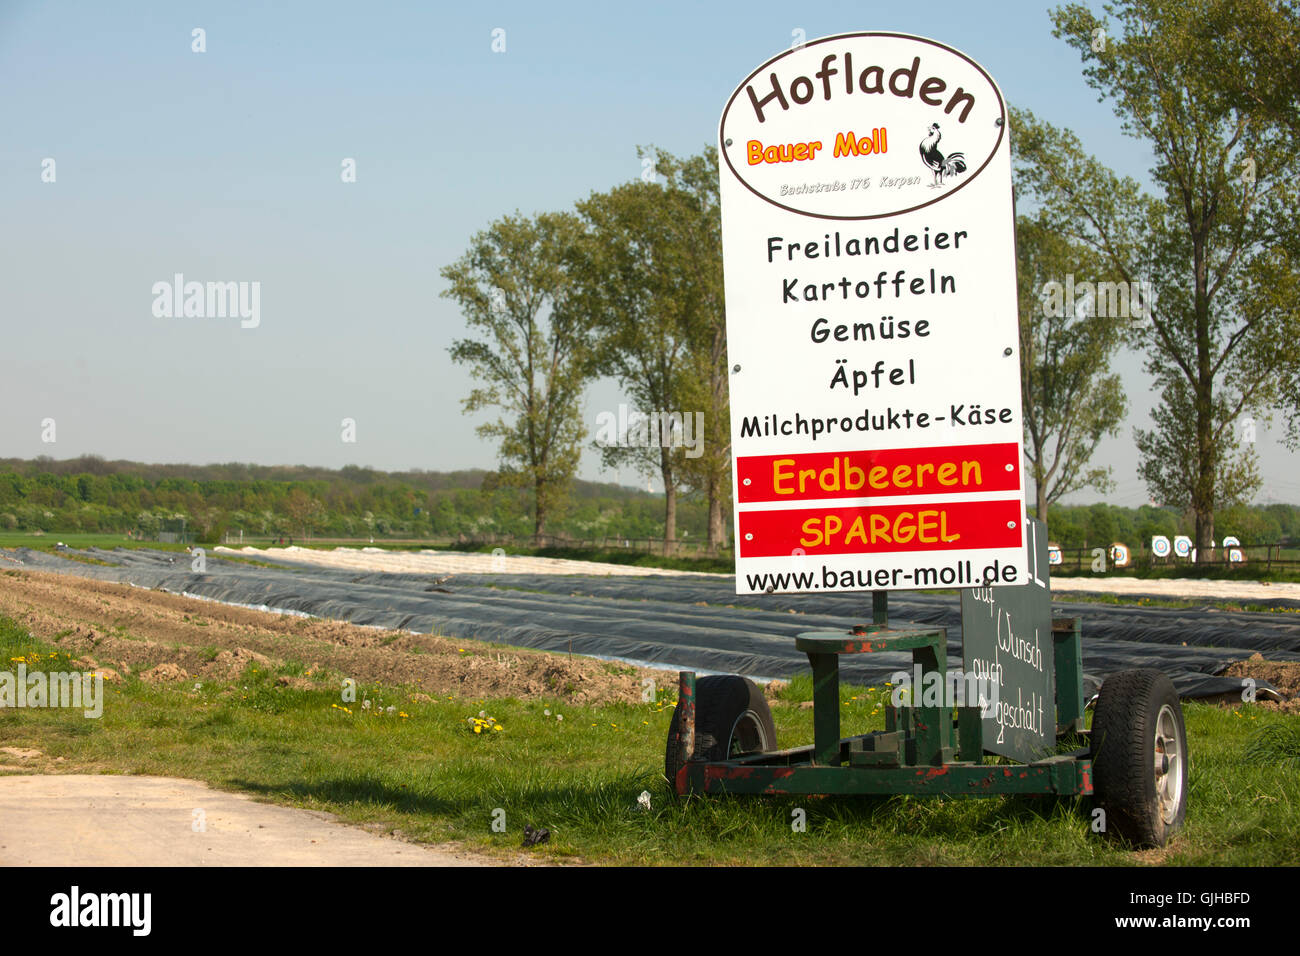 Deutschland, Nordrhein-Westfalen, Kreis Bergheim, Kerpen,  Hofladen Bauer Moll - Stock Image